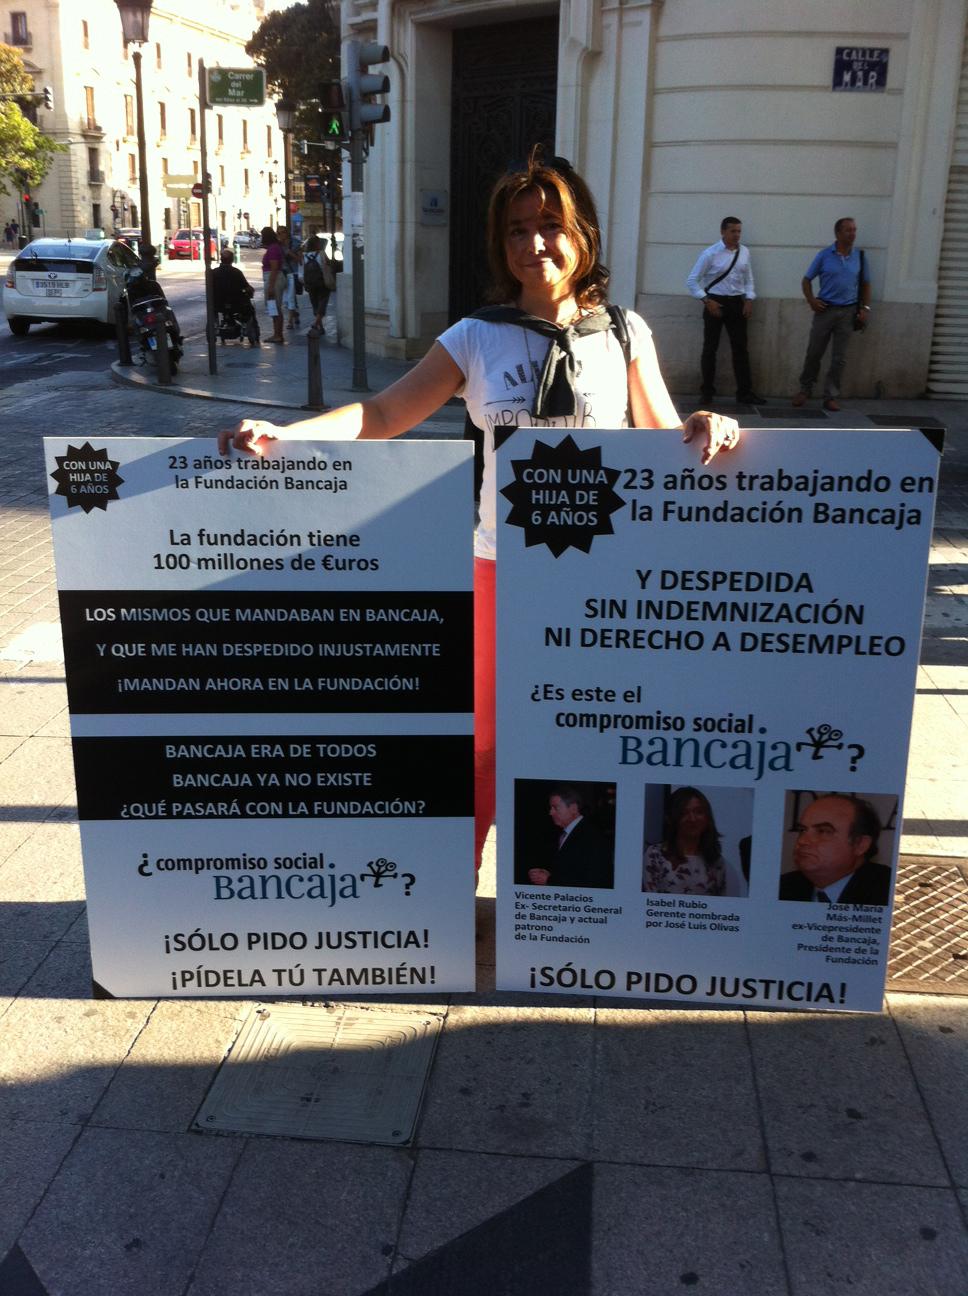 protesta-fundacion-bancaja-2